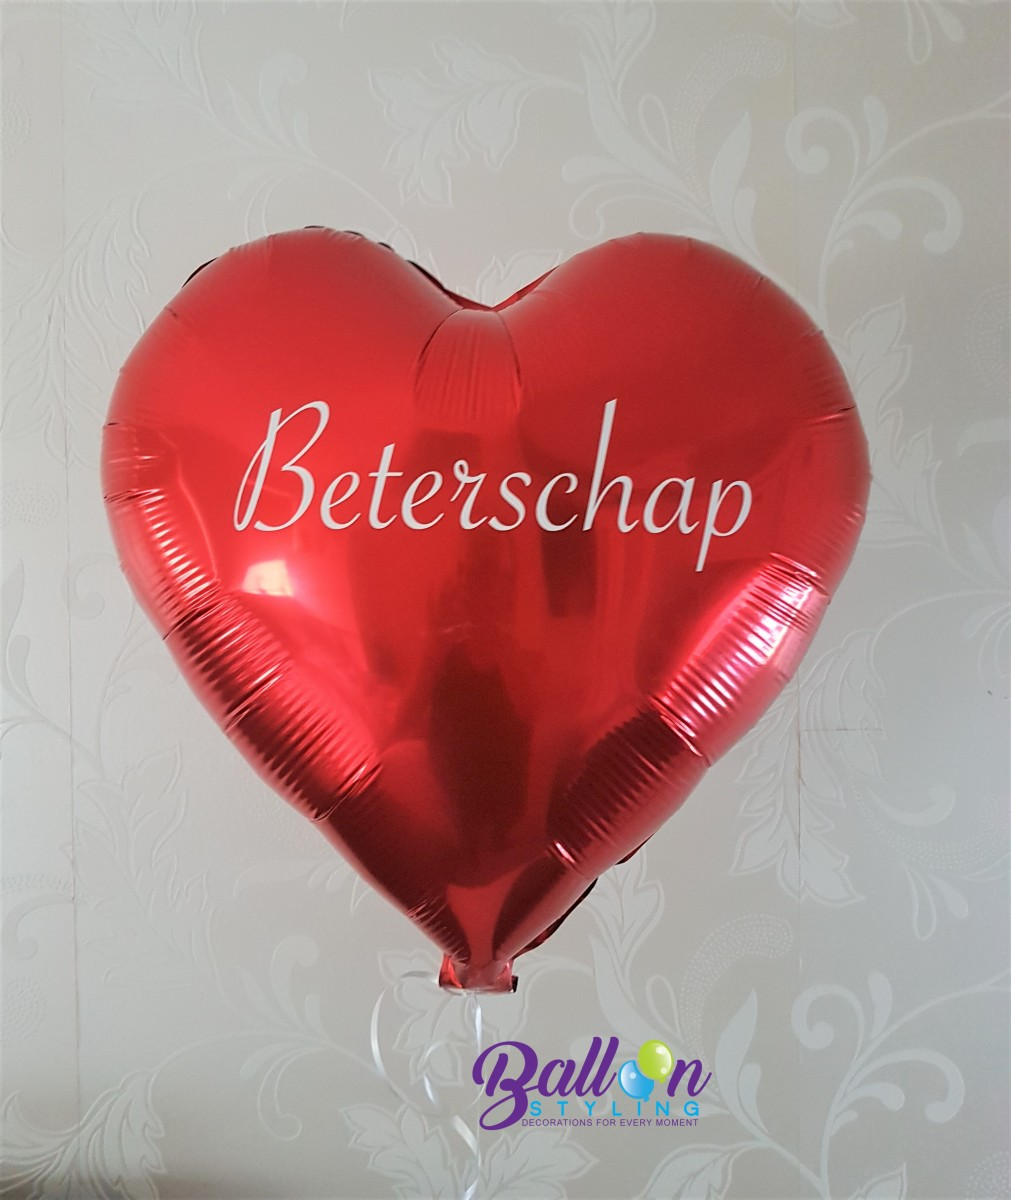 Balloon Styling Tilburg gepersonaliseerde bedrukte ballon beterschap ballonnen Tilburg (1)